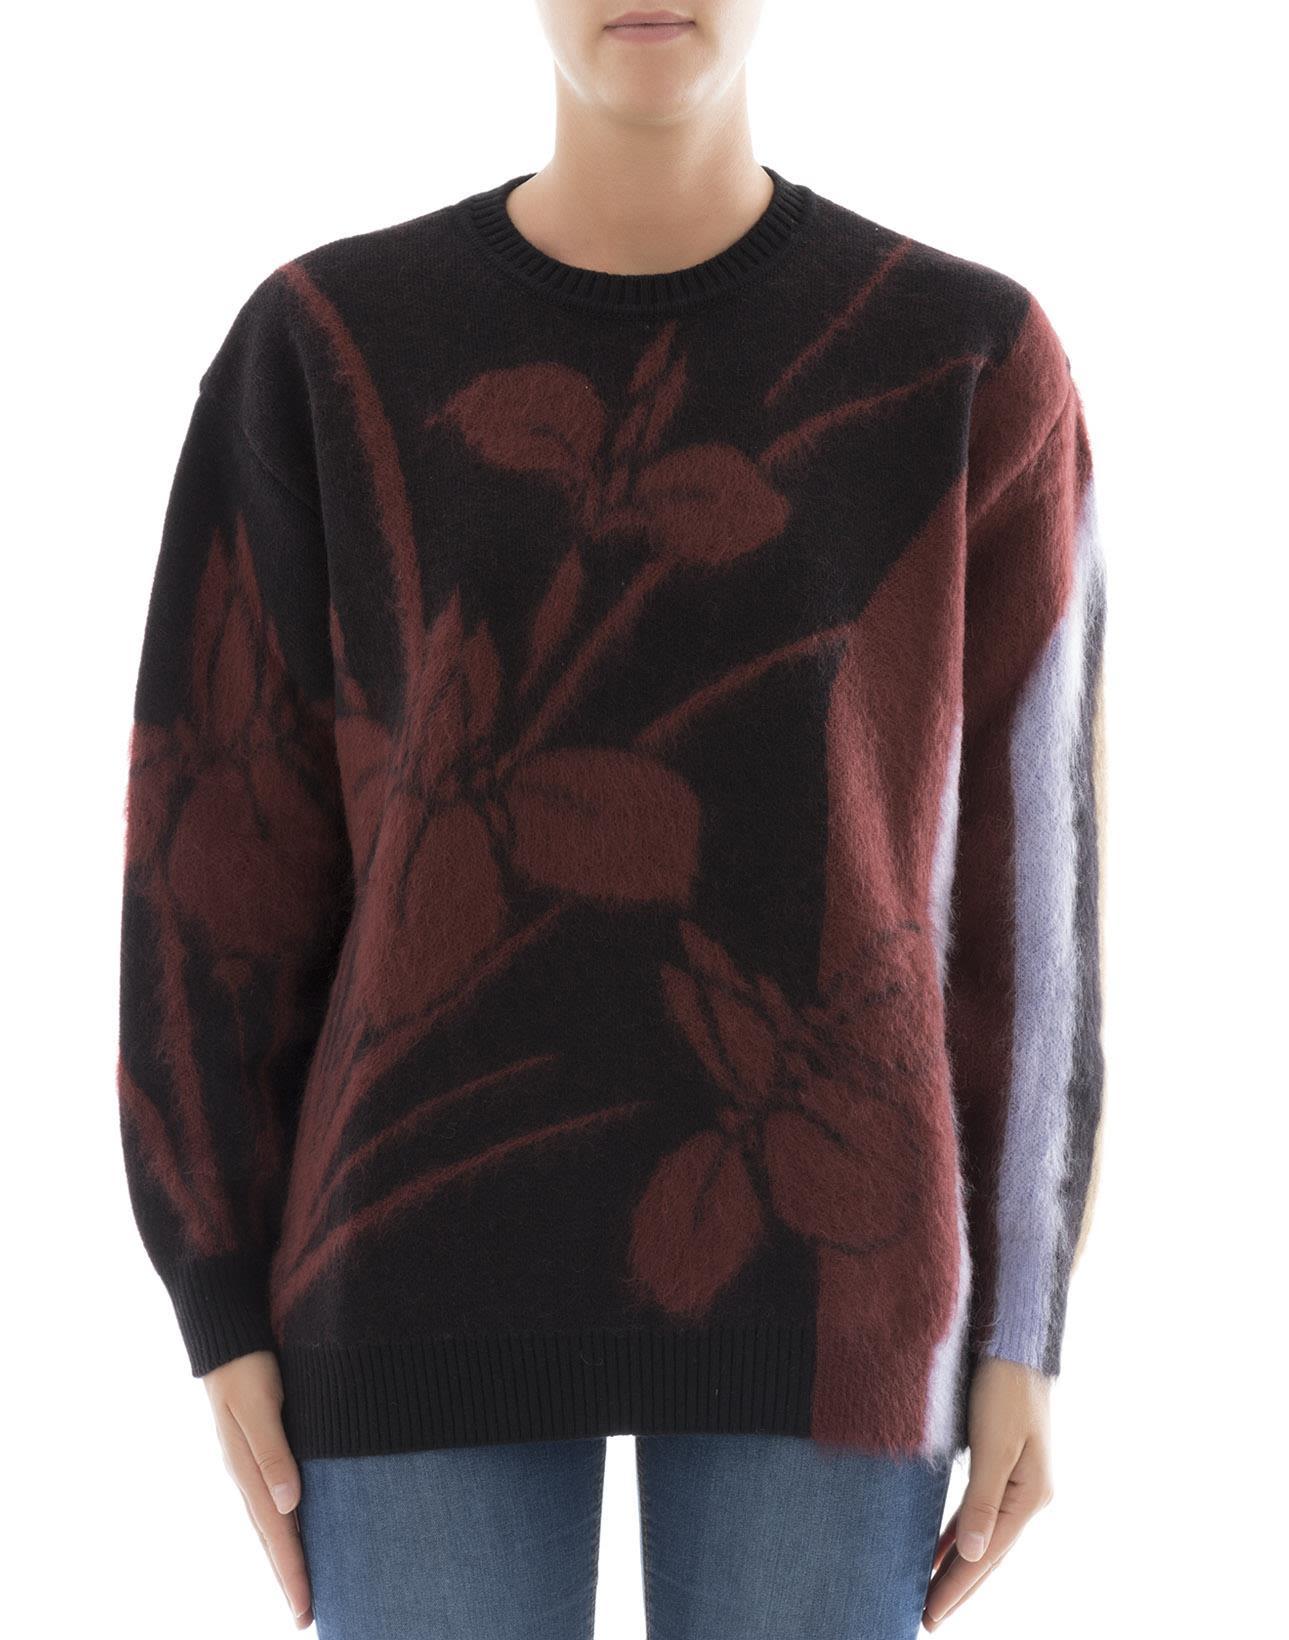 Black Mohair Sweatshirt